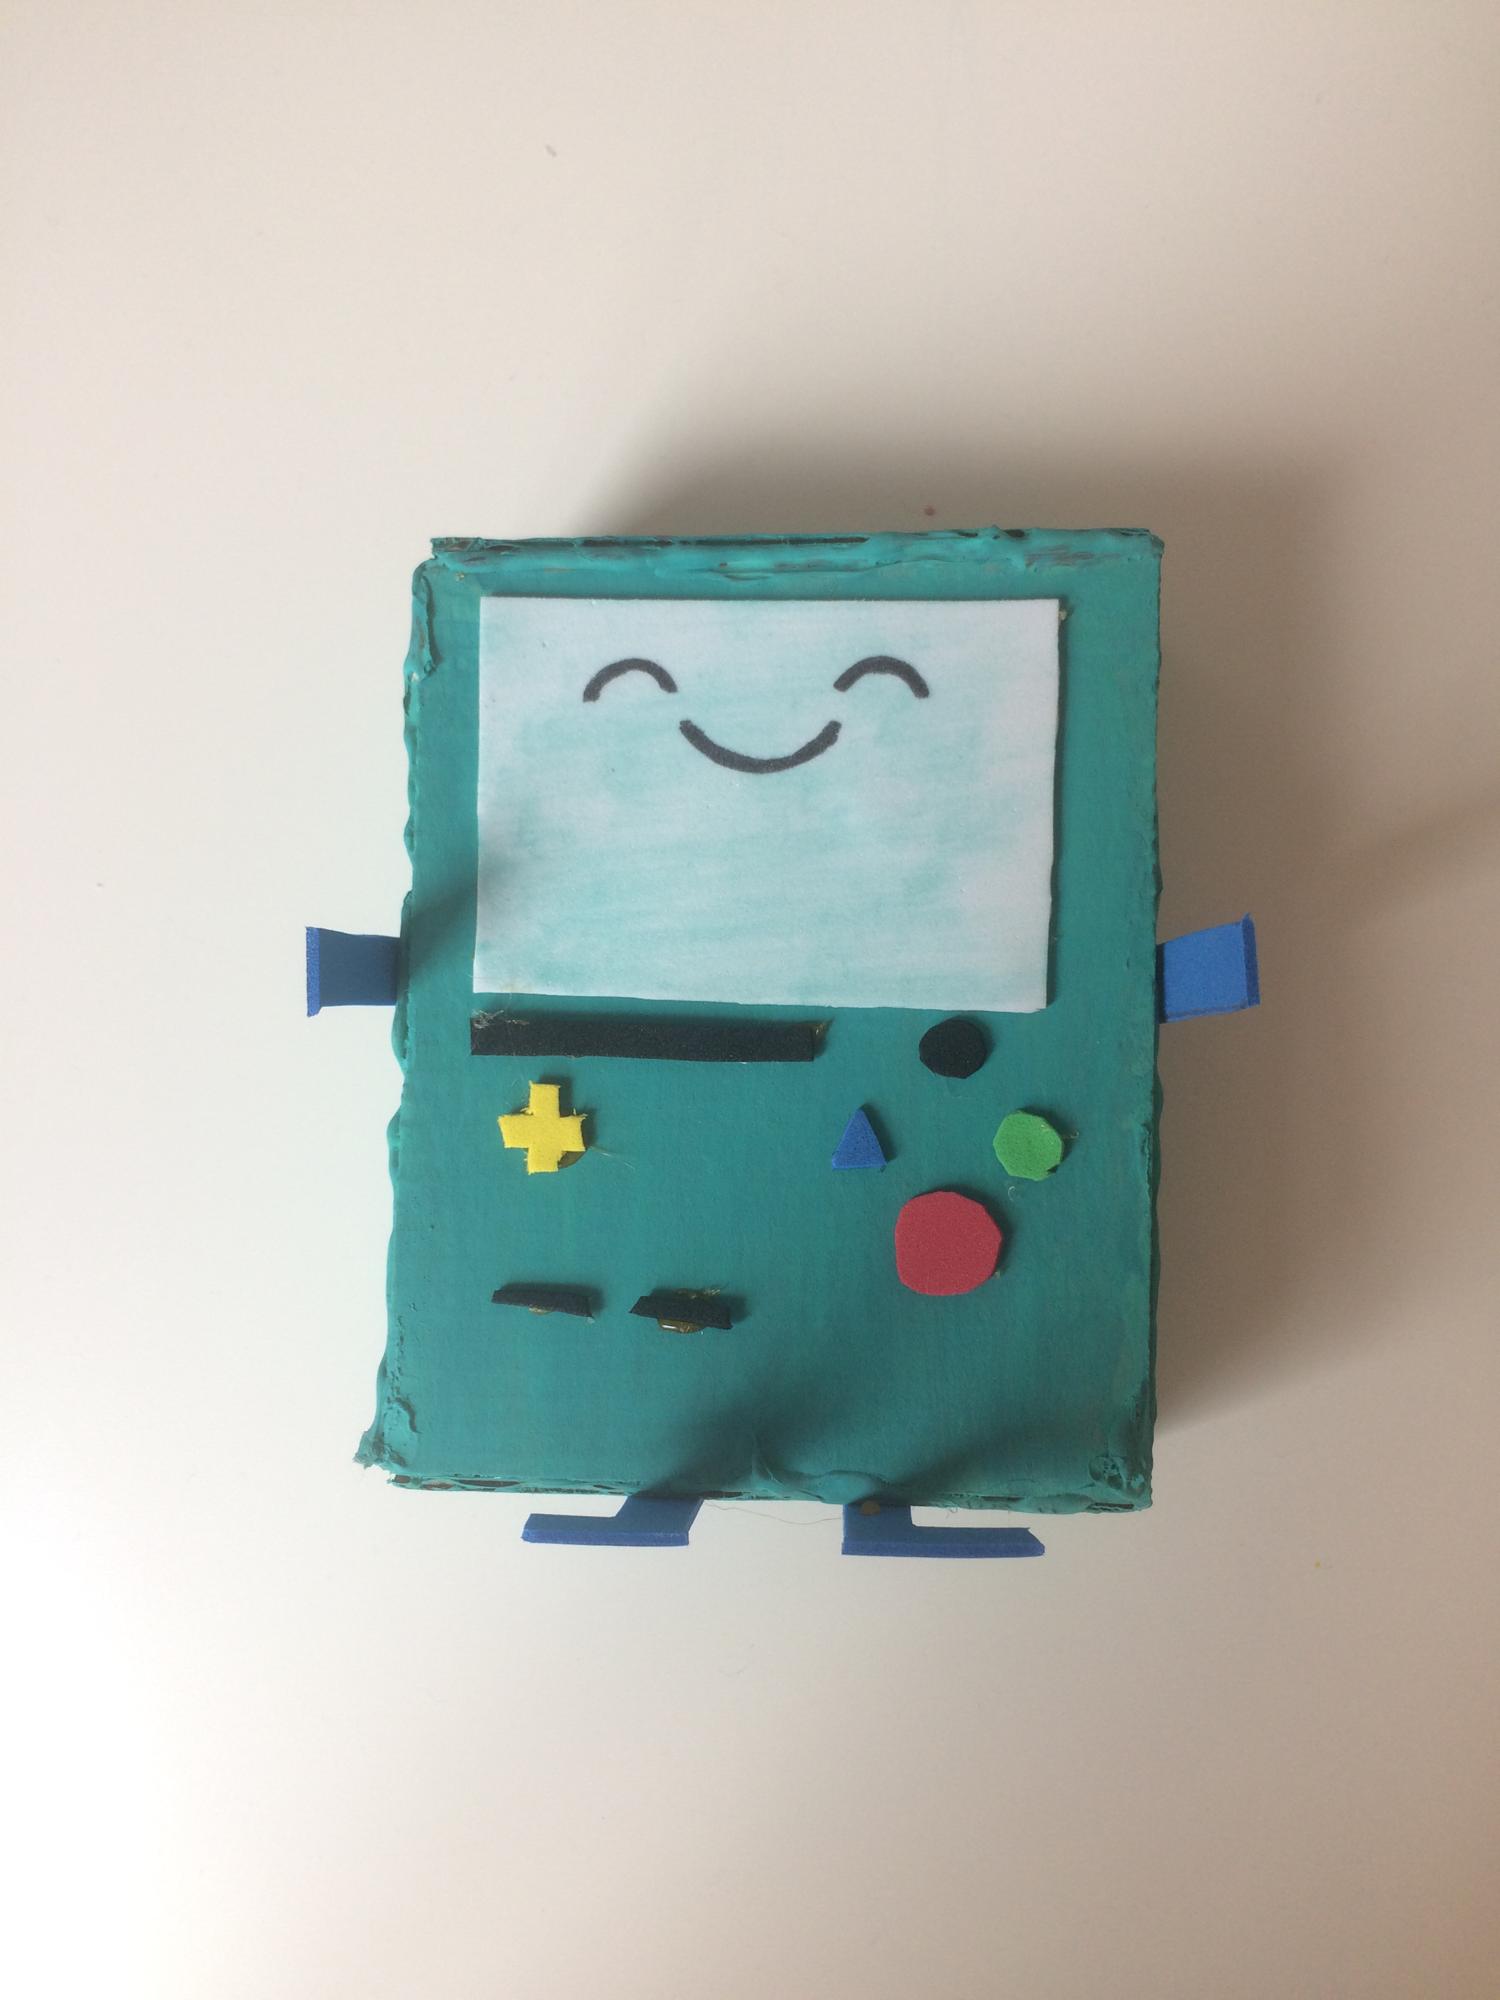 I made a cardboard BMO😇